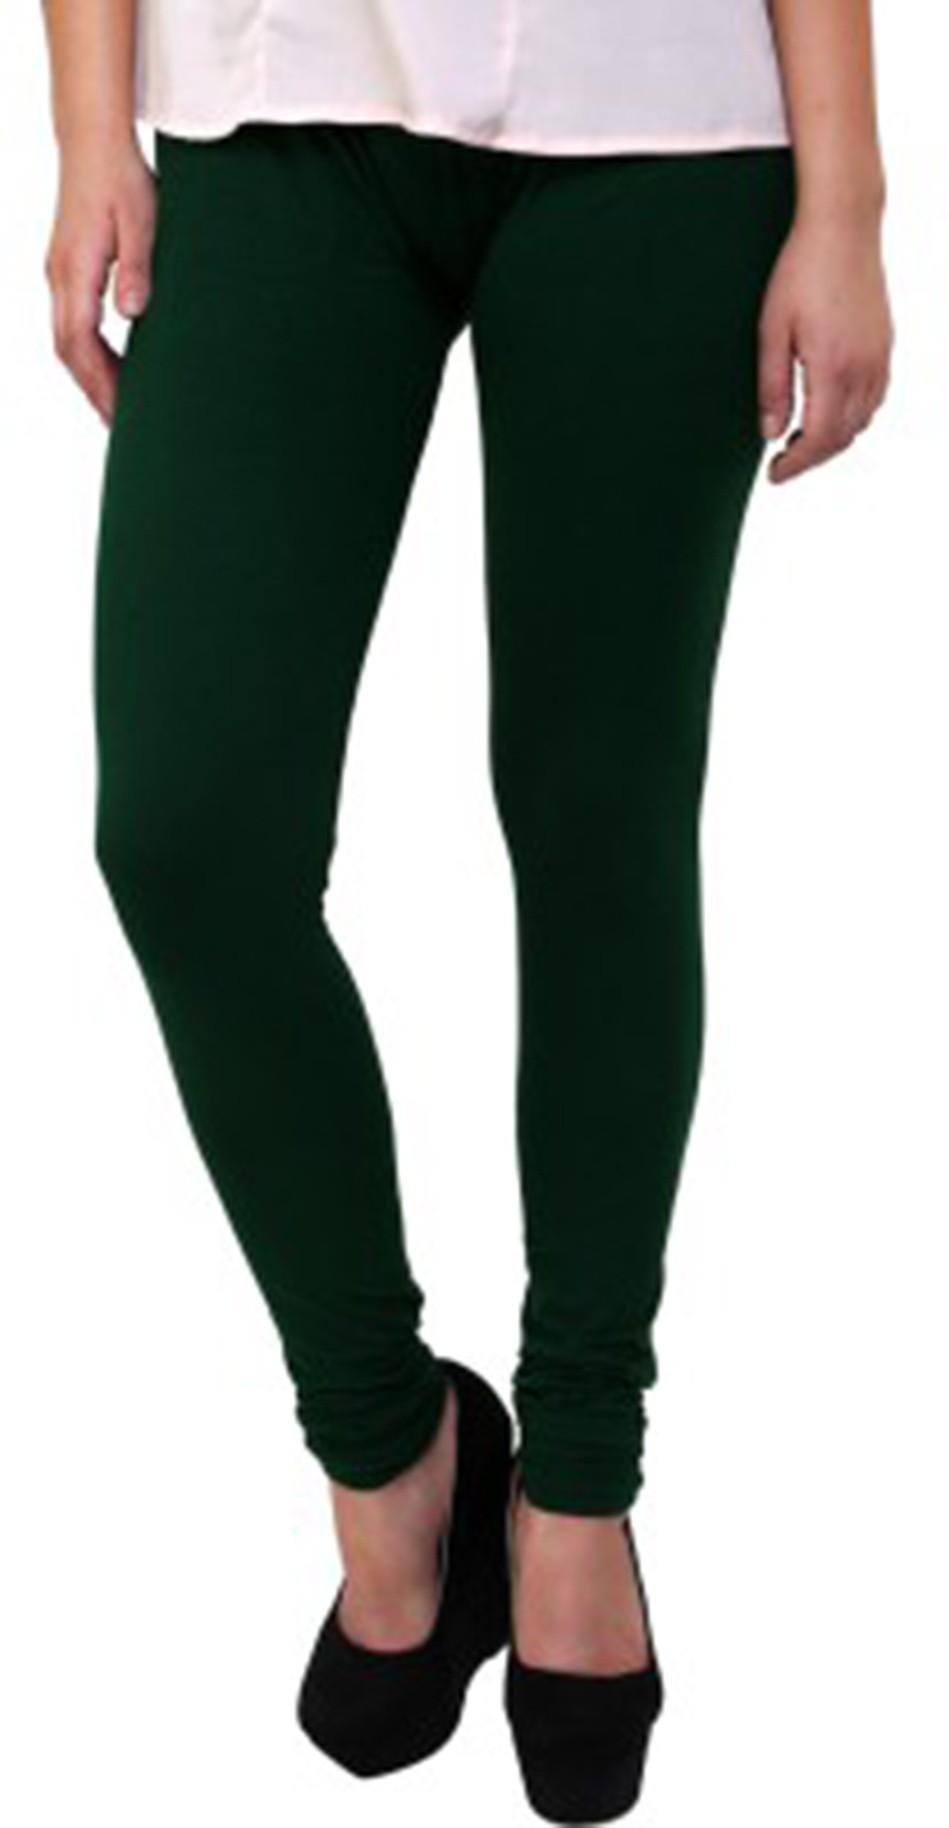 Fashionista Womens Green Leggings